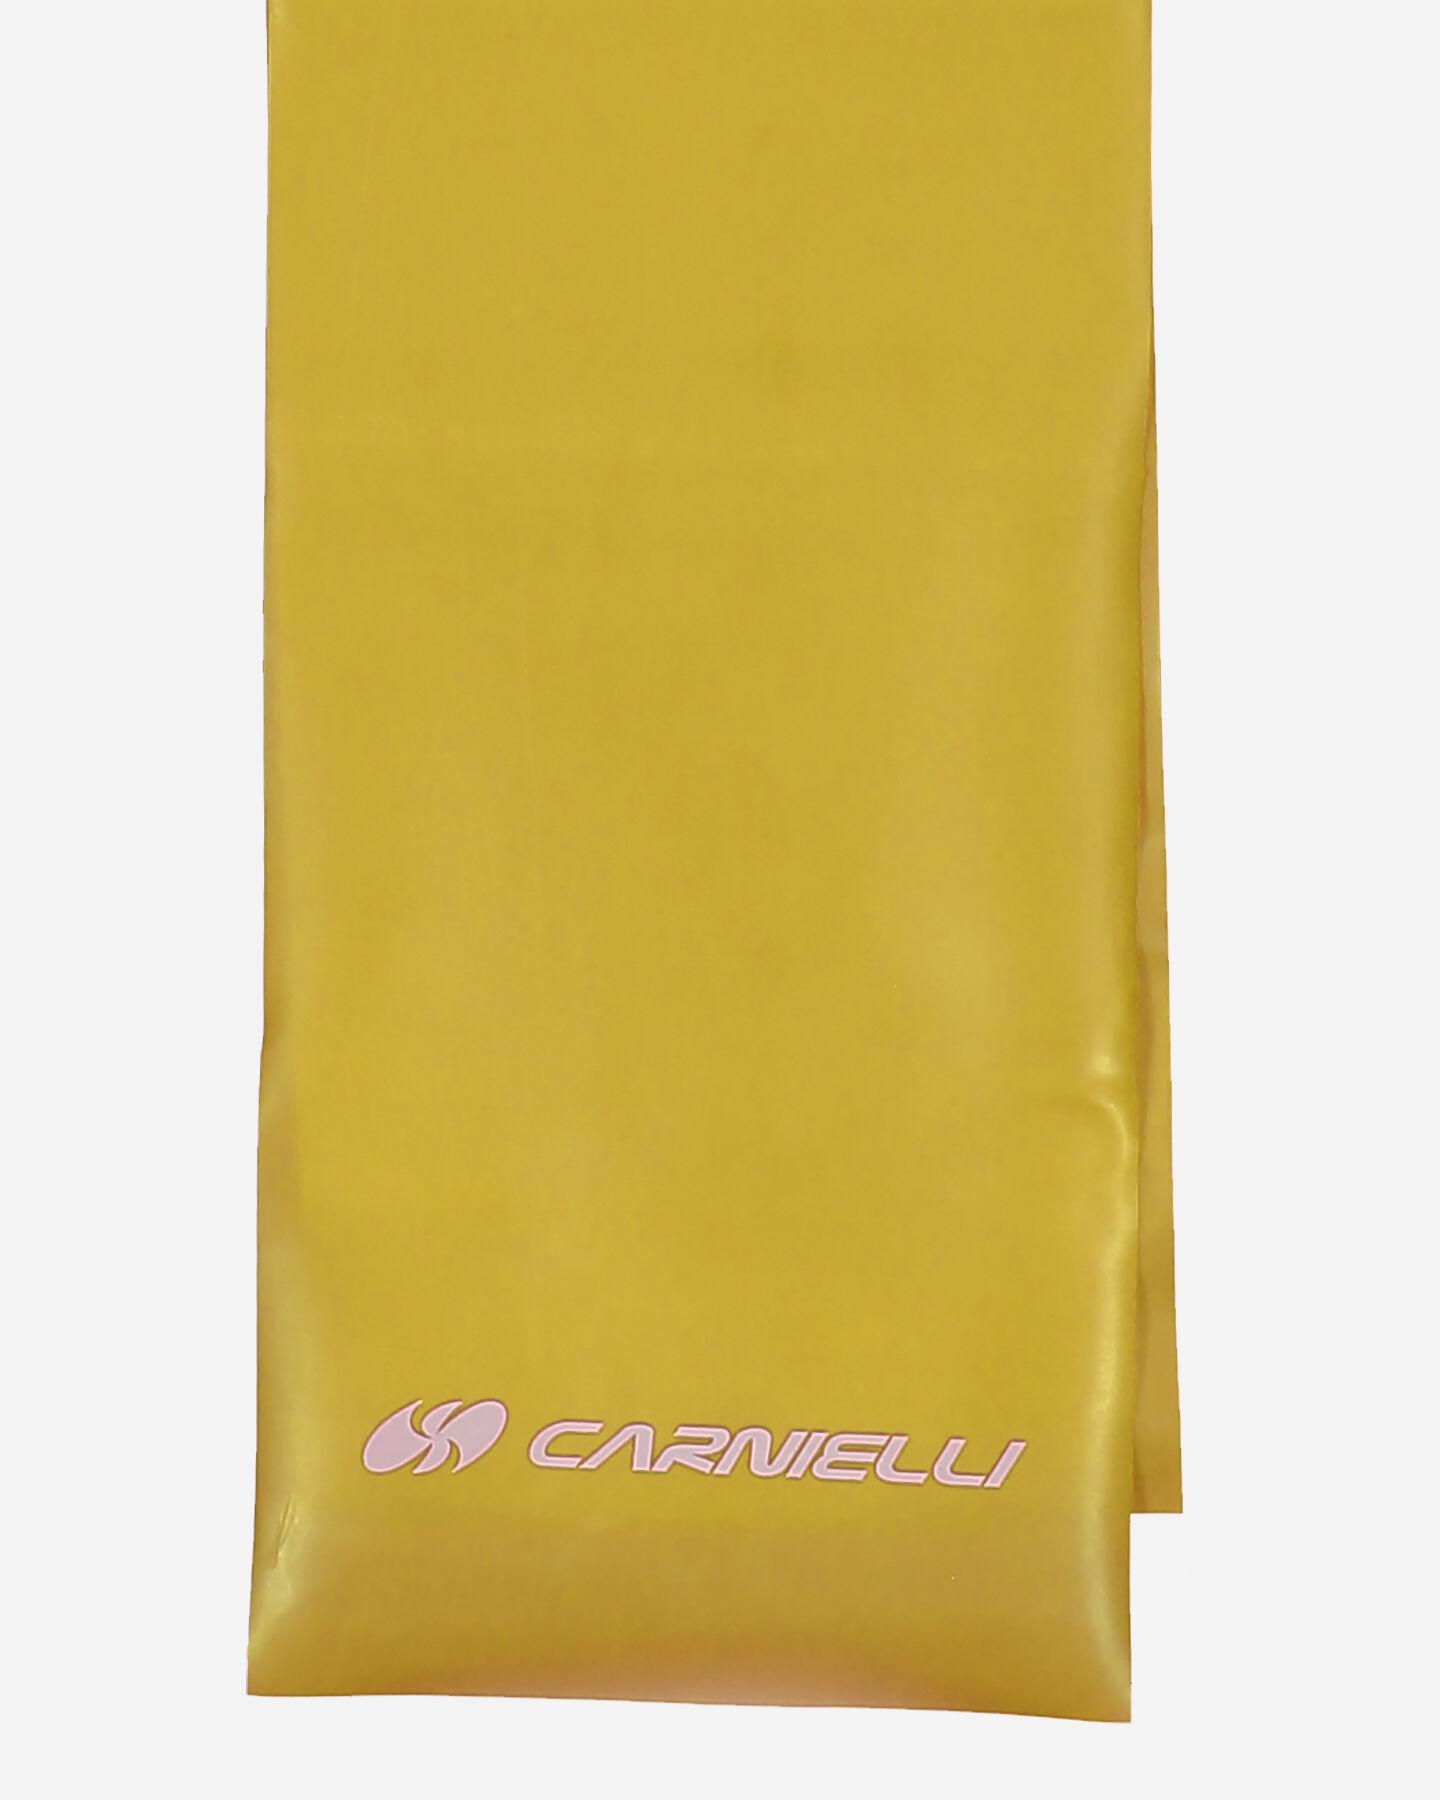 Banda elastica CARNIELLI BANDA ELASTICA 175 CM S1326883|1|UNI scatto 1